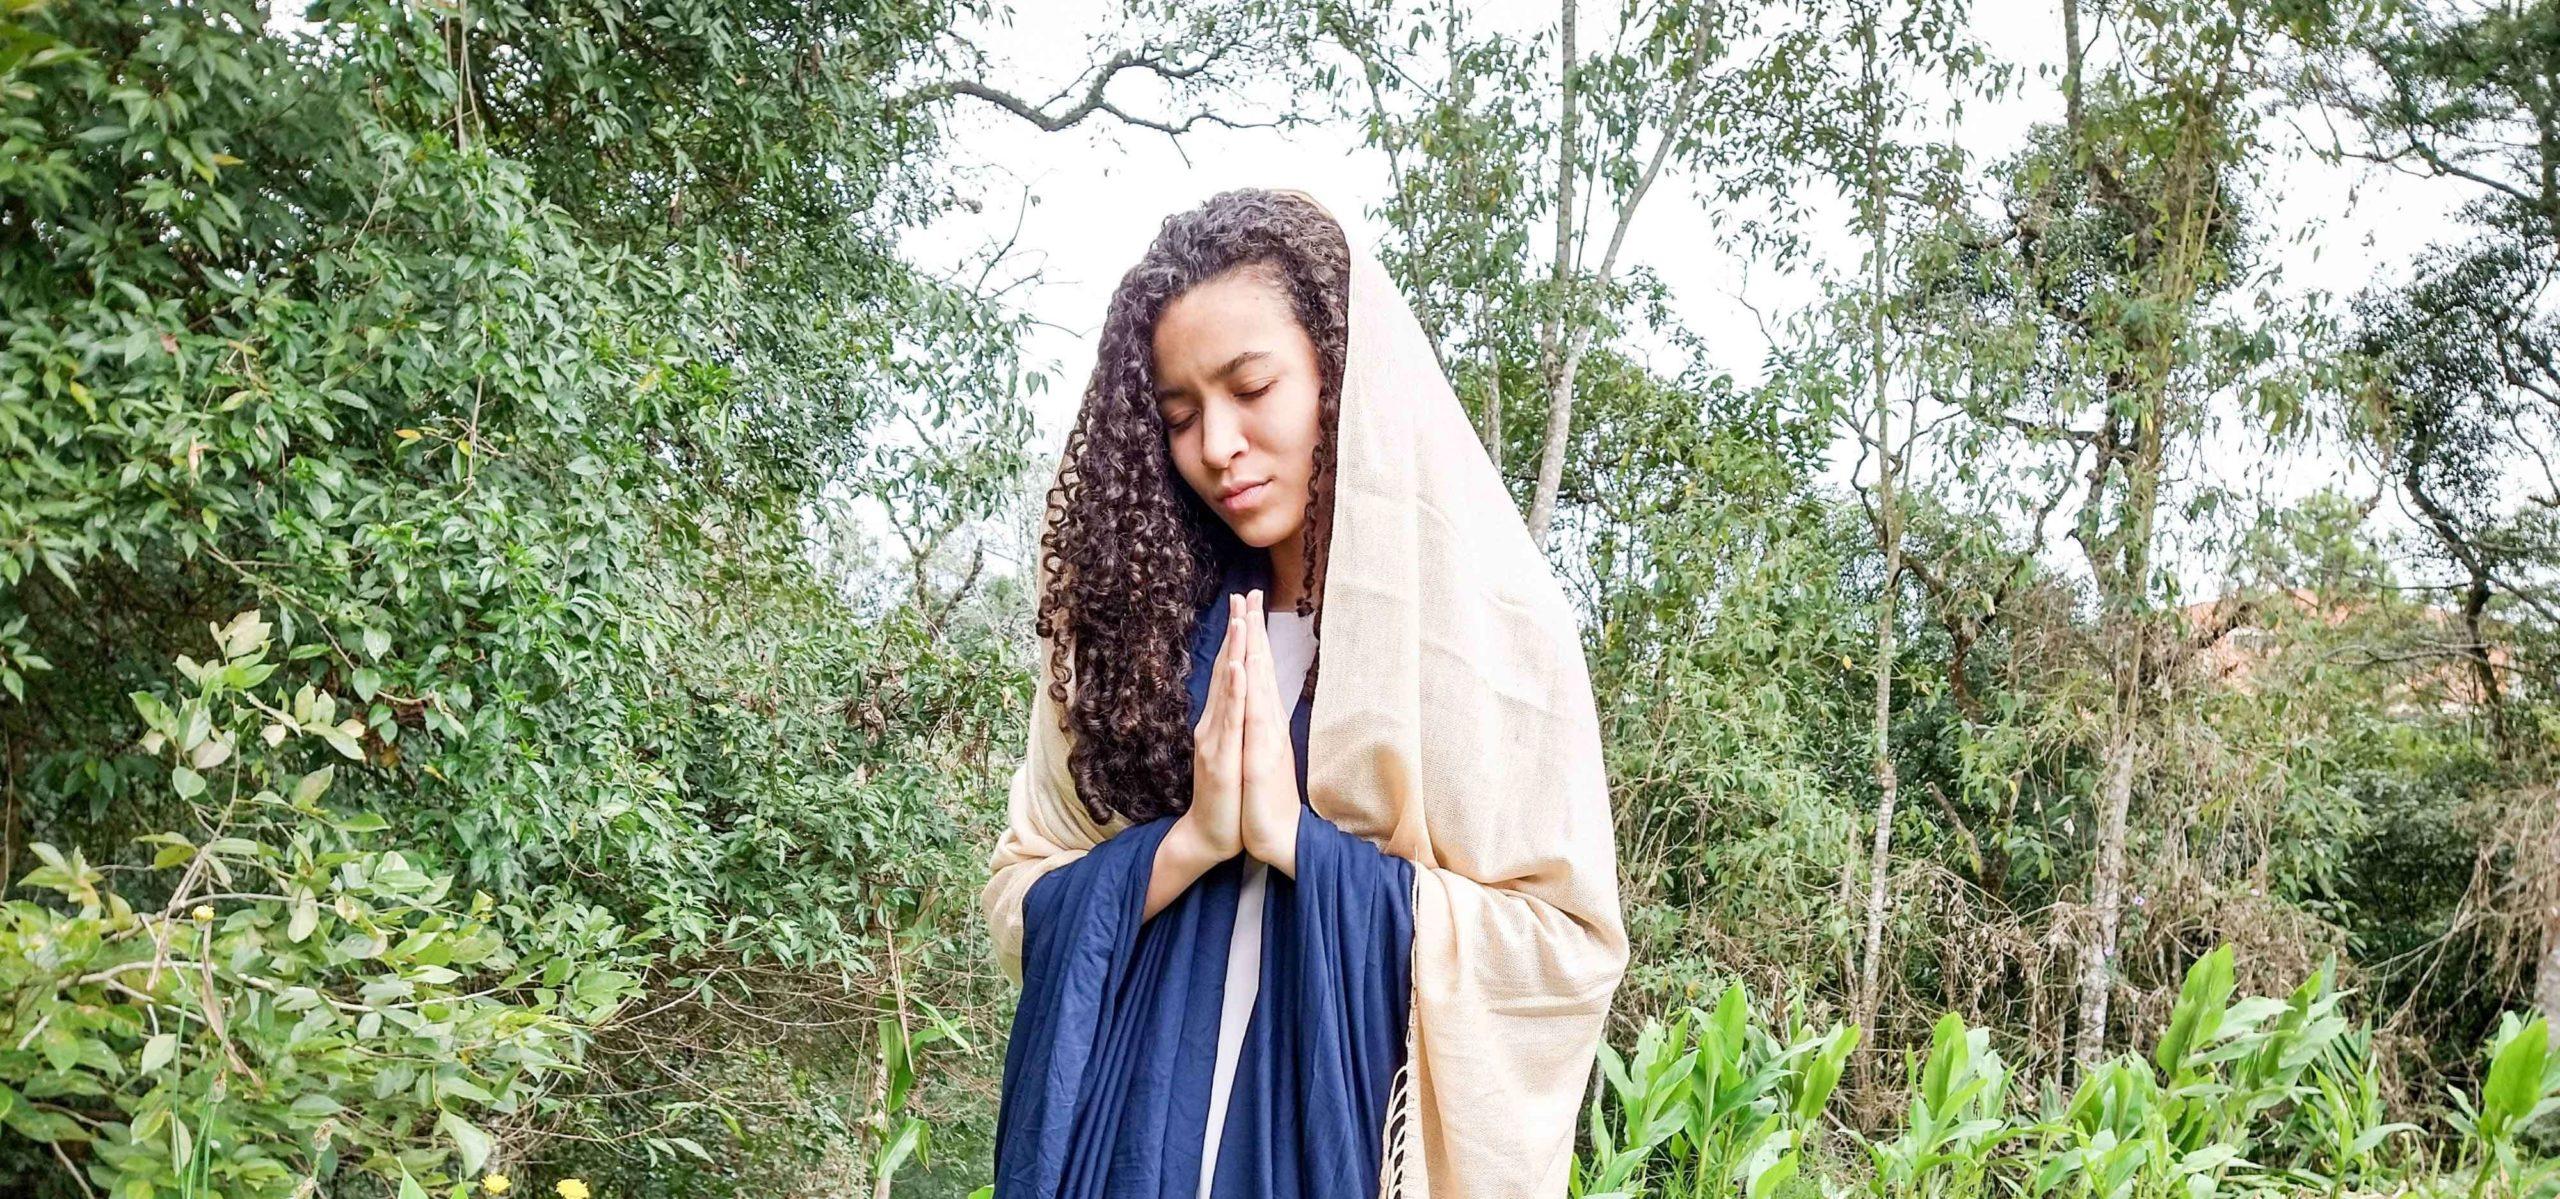 Hannah, mother of Samuel, depicted praying